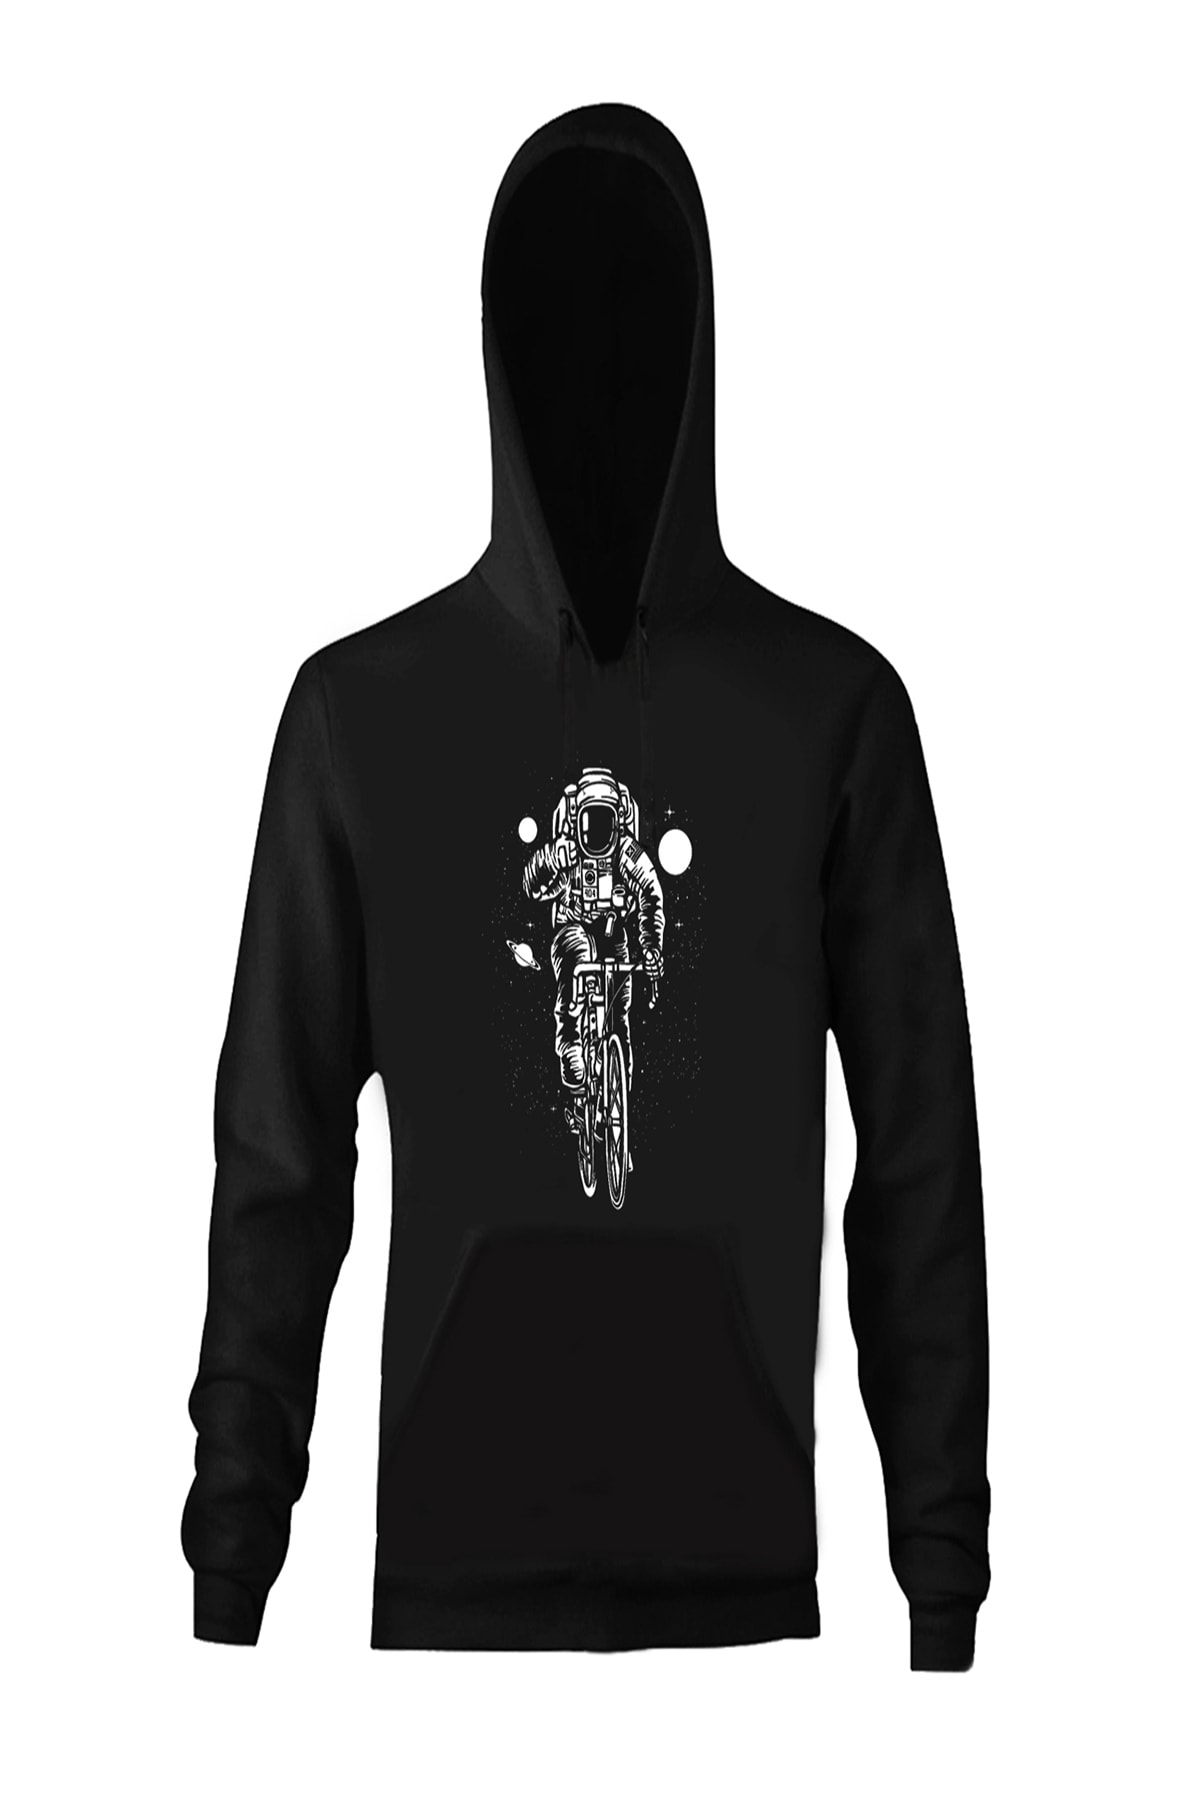 Unisex Sweatshirt Cycling In Space Baskılı Tasarım